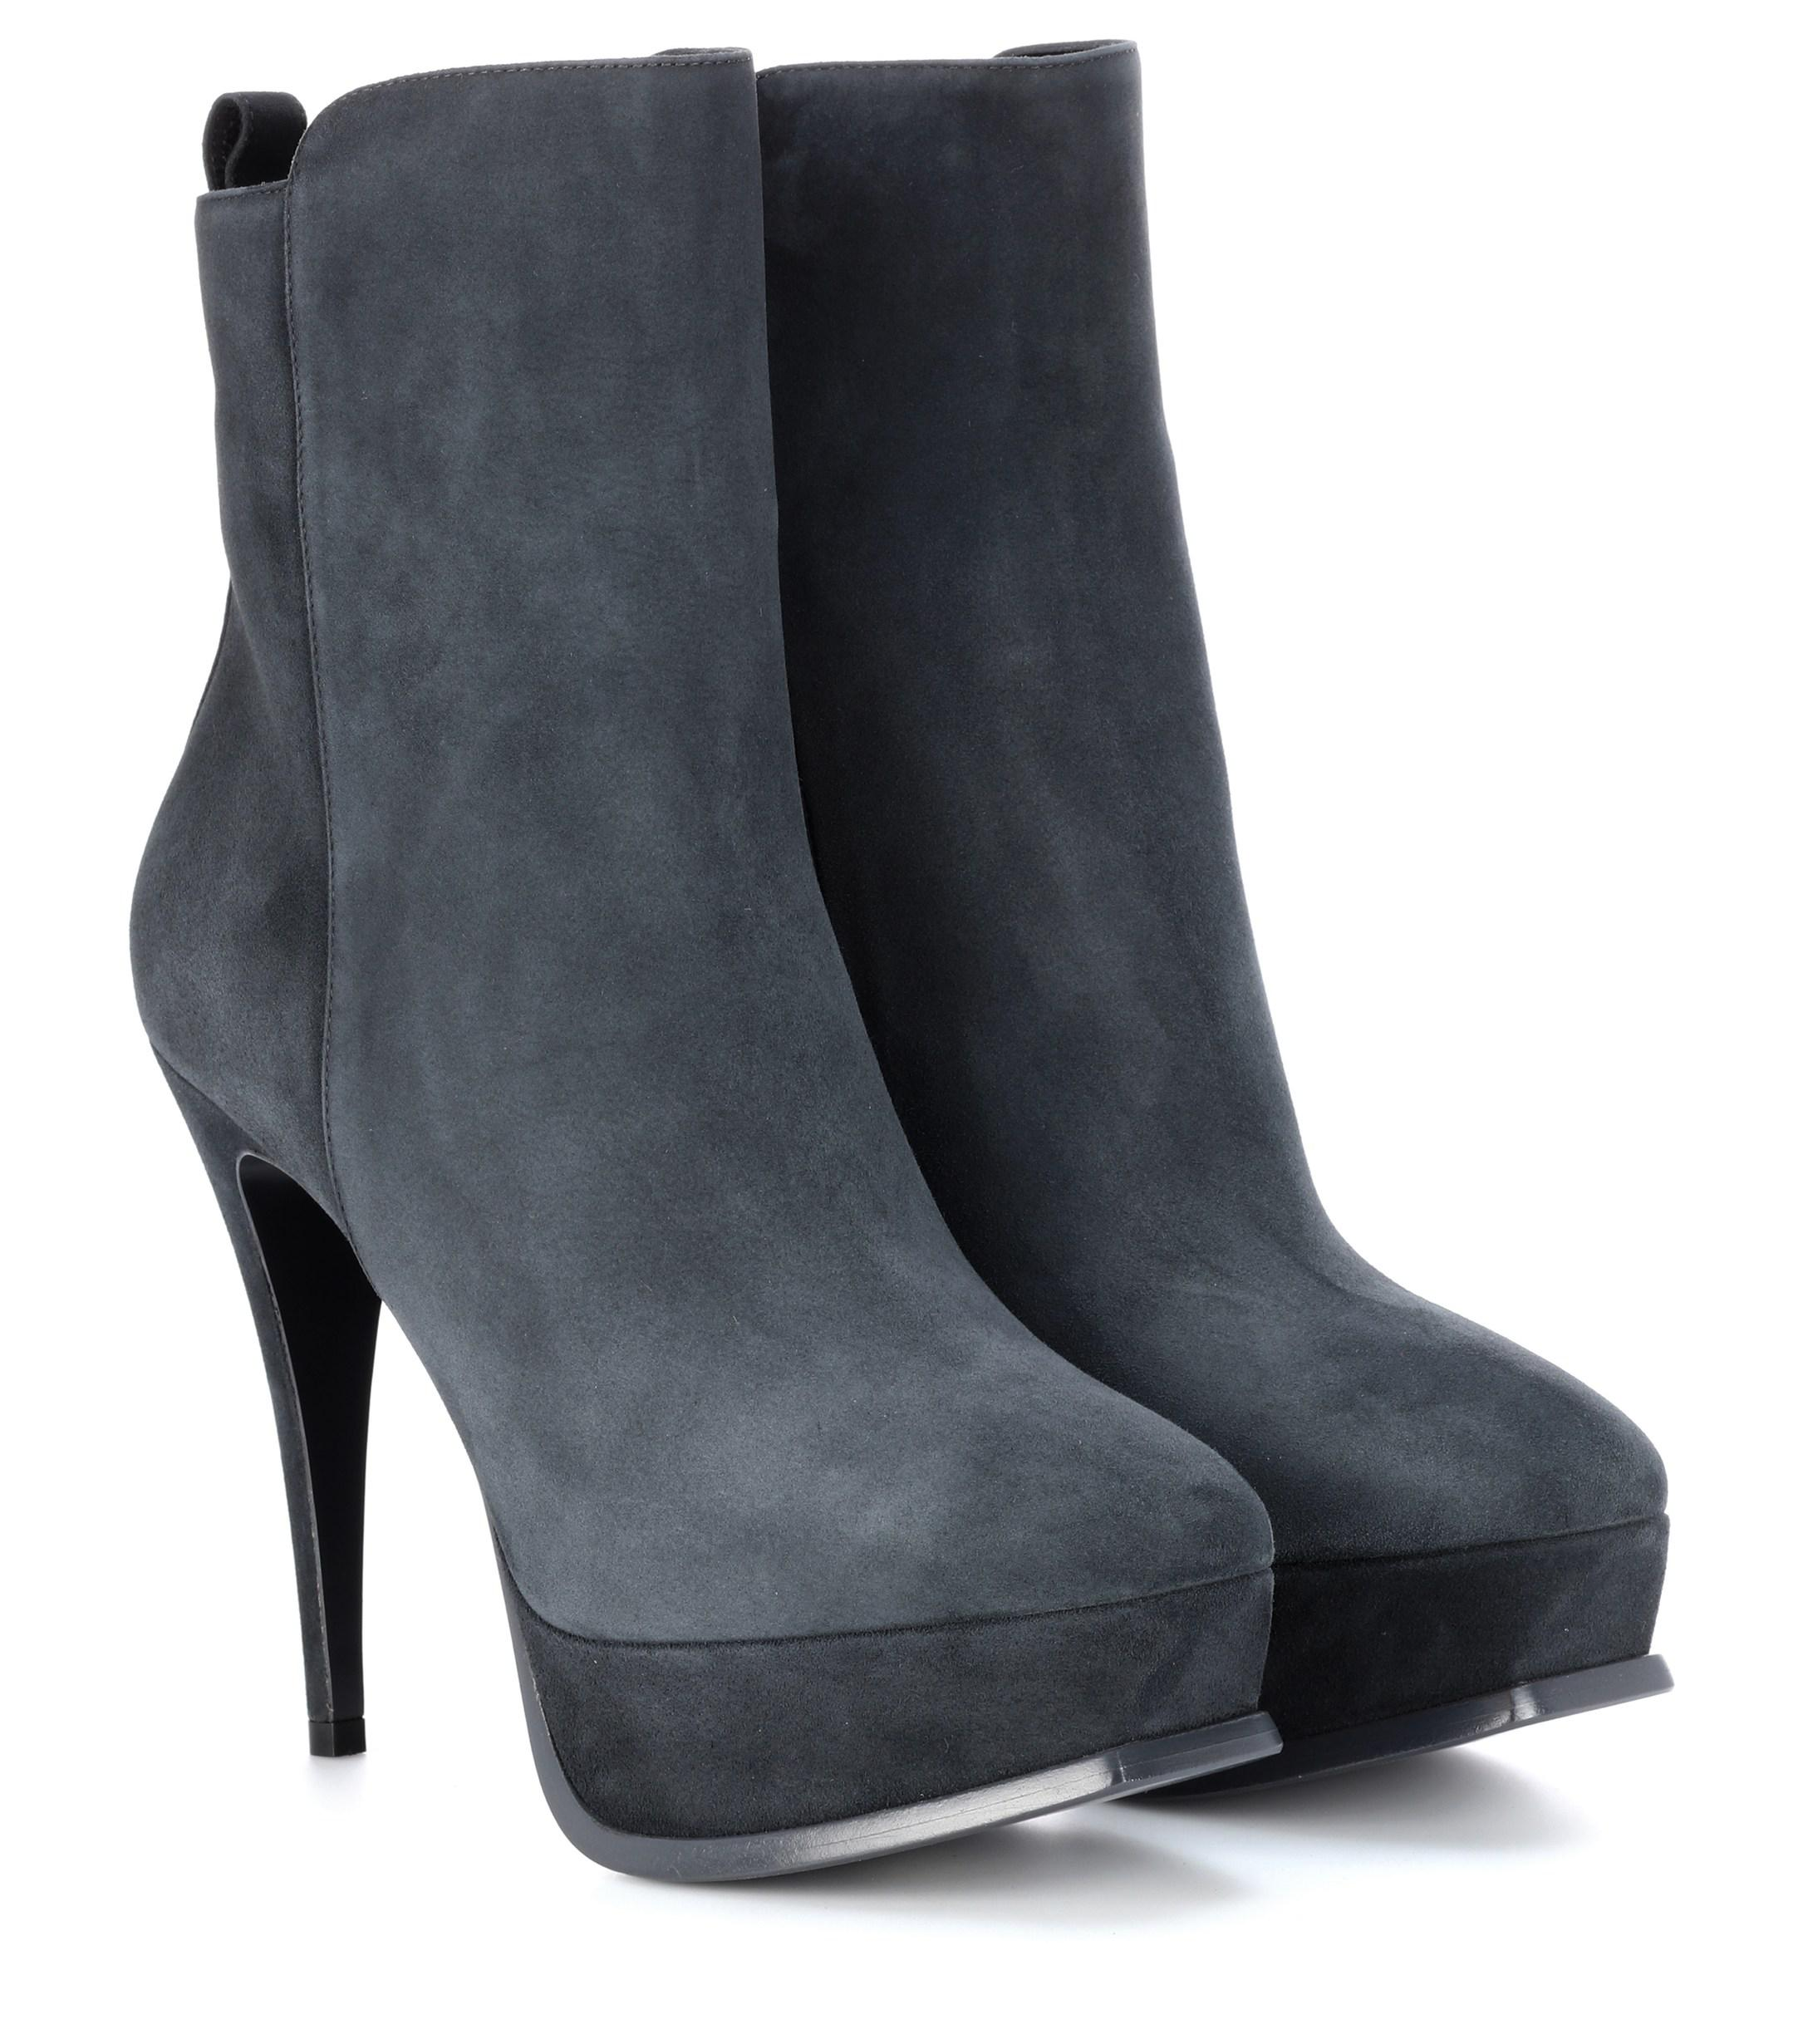 3768b2aa60035 Saint Laurent. Women s Tribute 90 Suede Ankle Boots